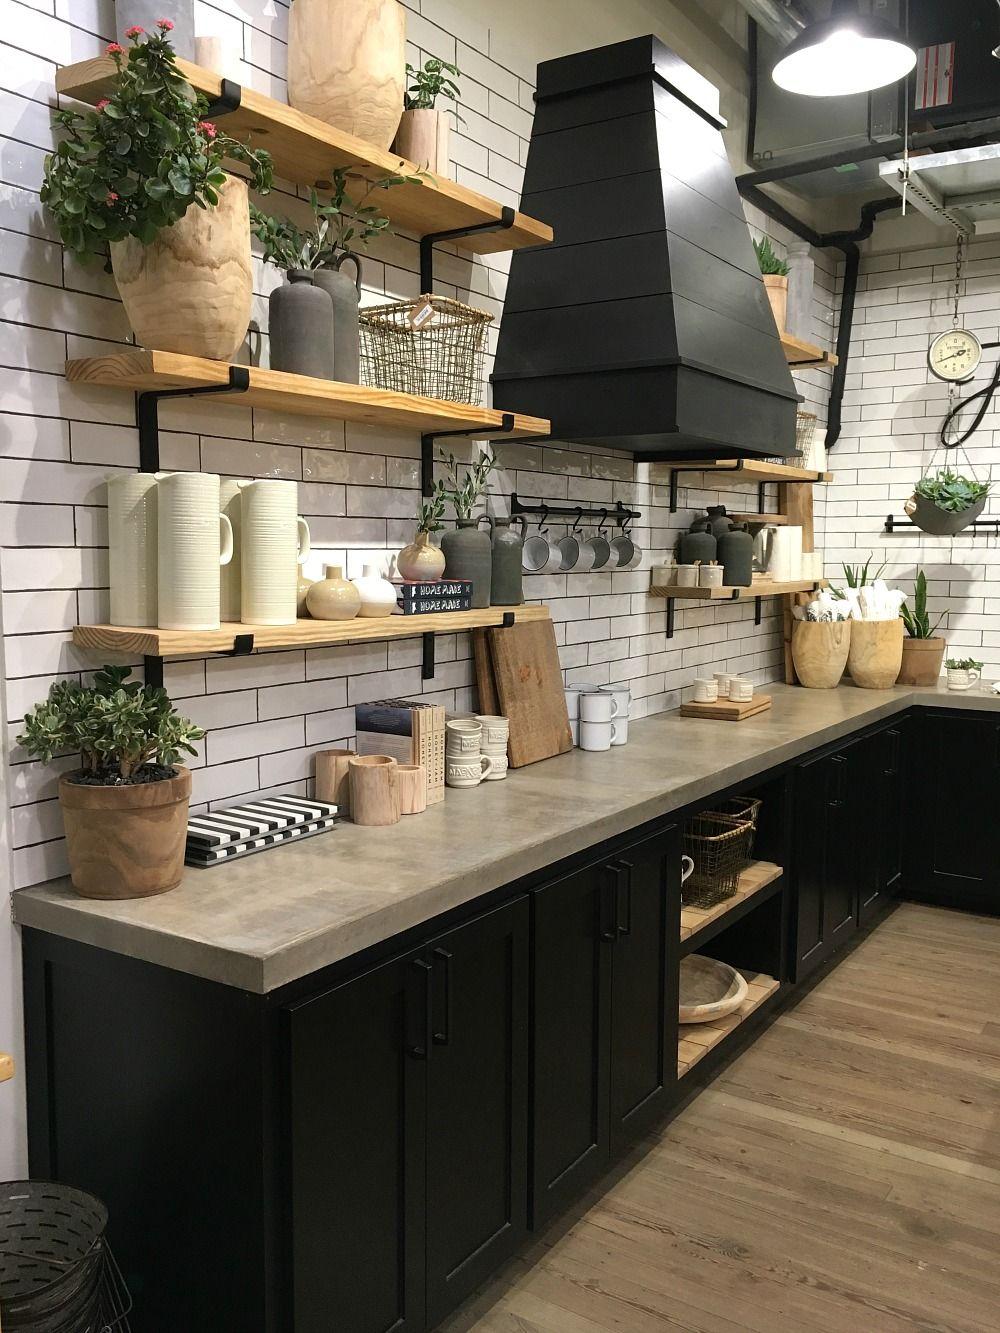 my trip to magnolia market things to know if you visit kitchen design kitchen styling on farmhouse kitchen kitchen id=56756